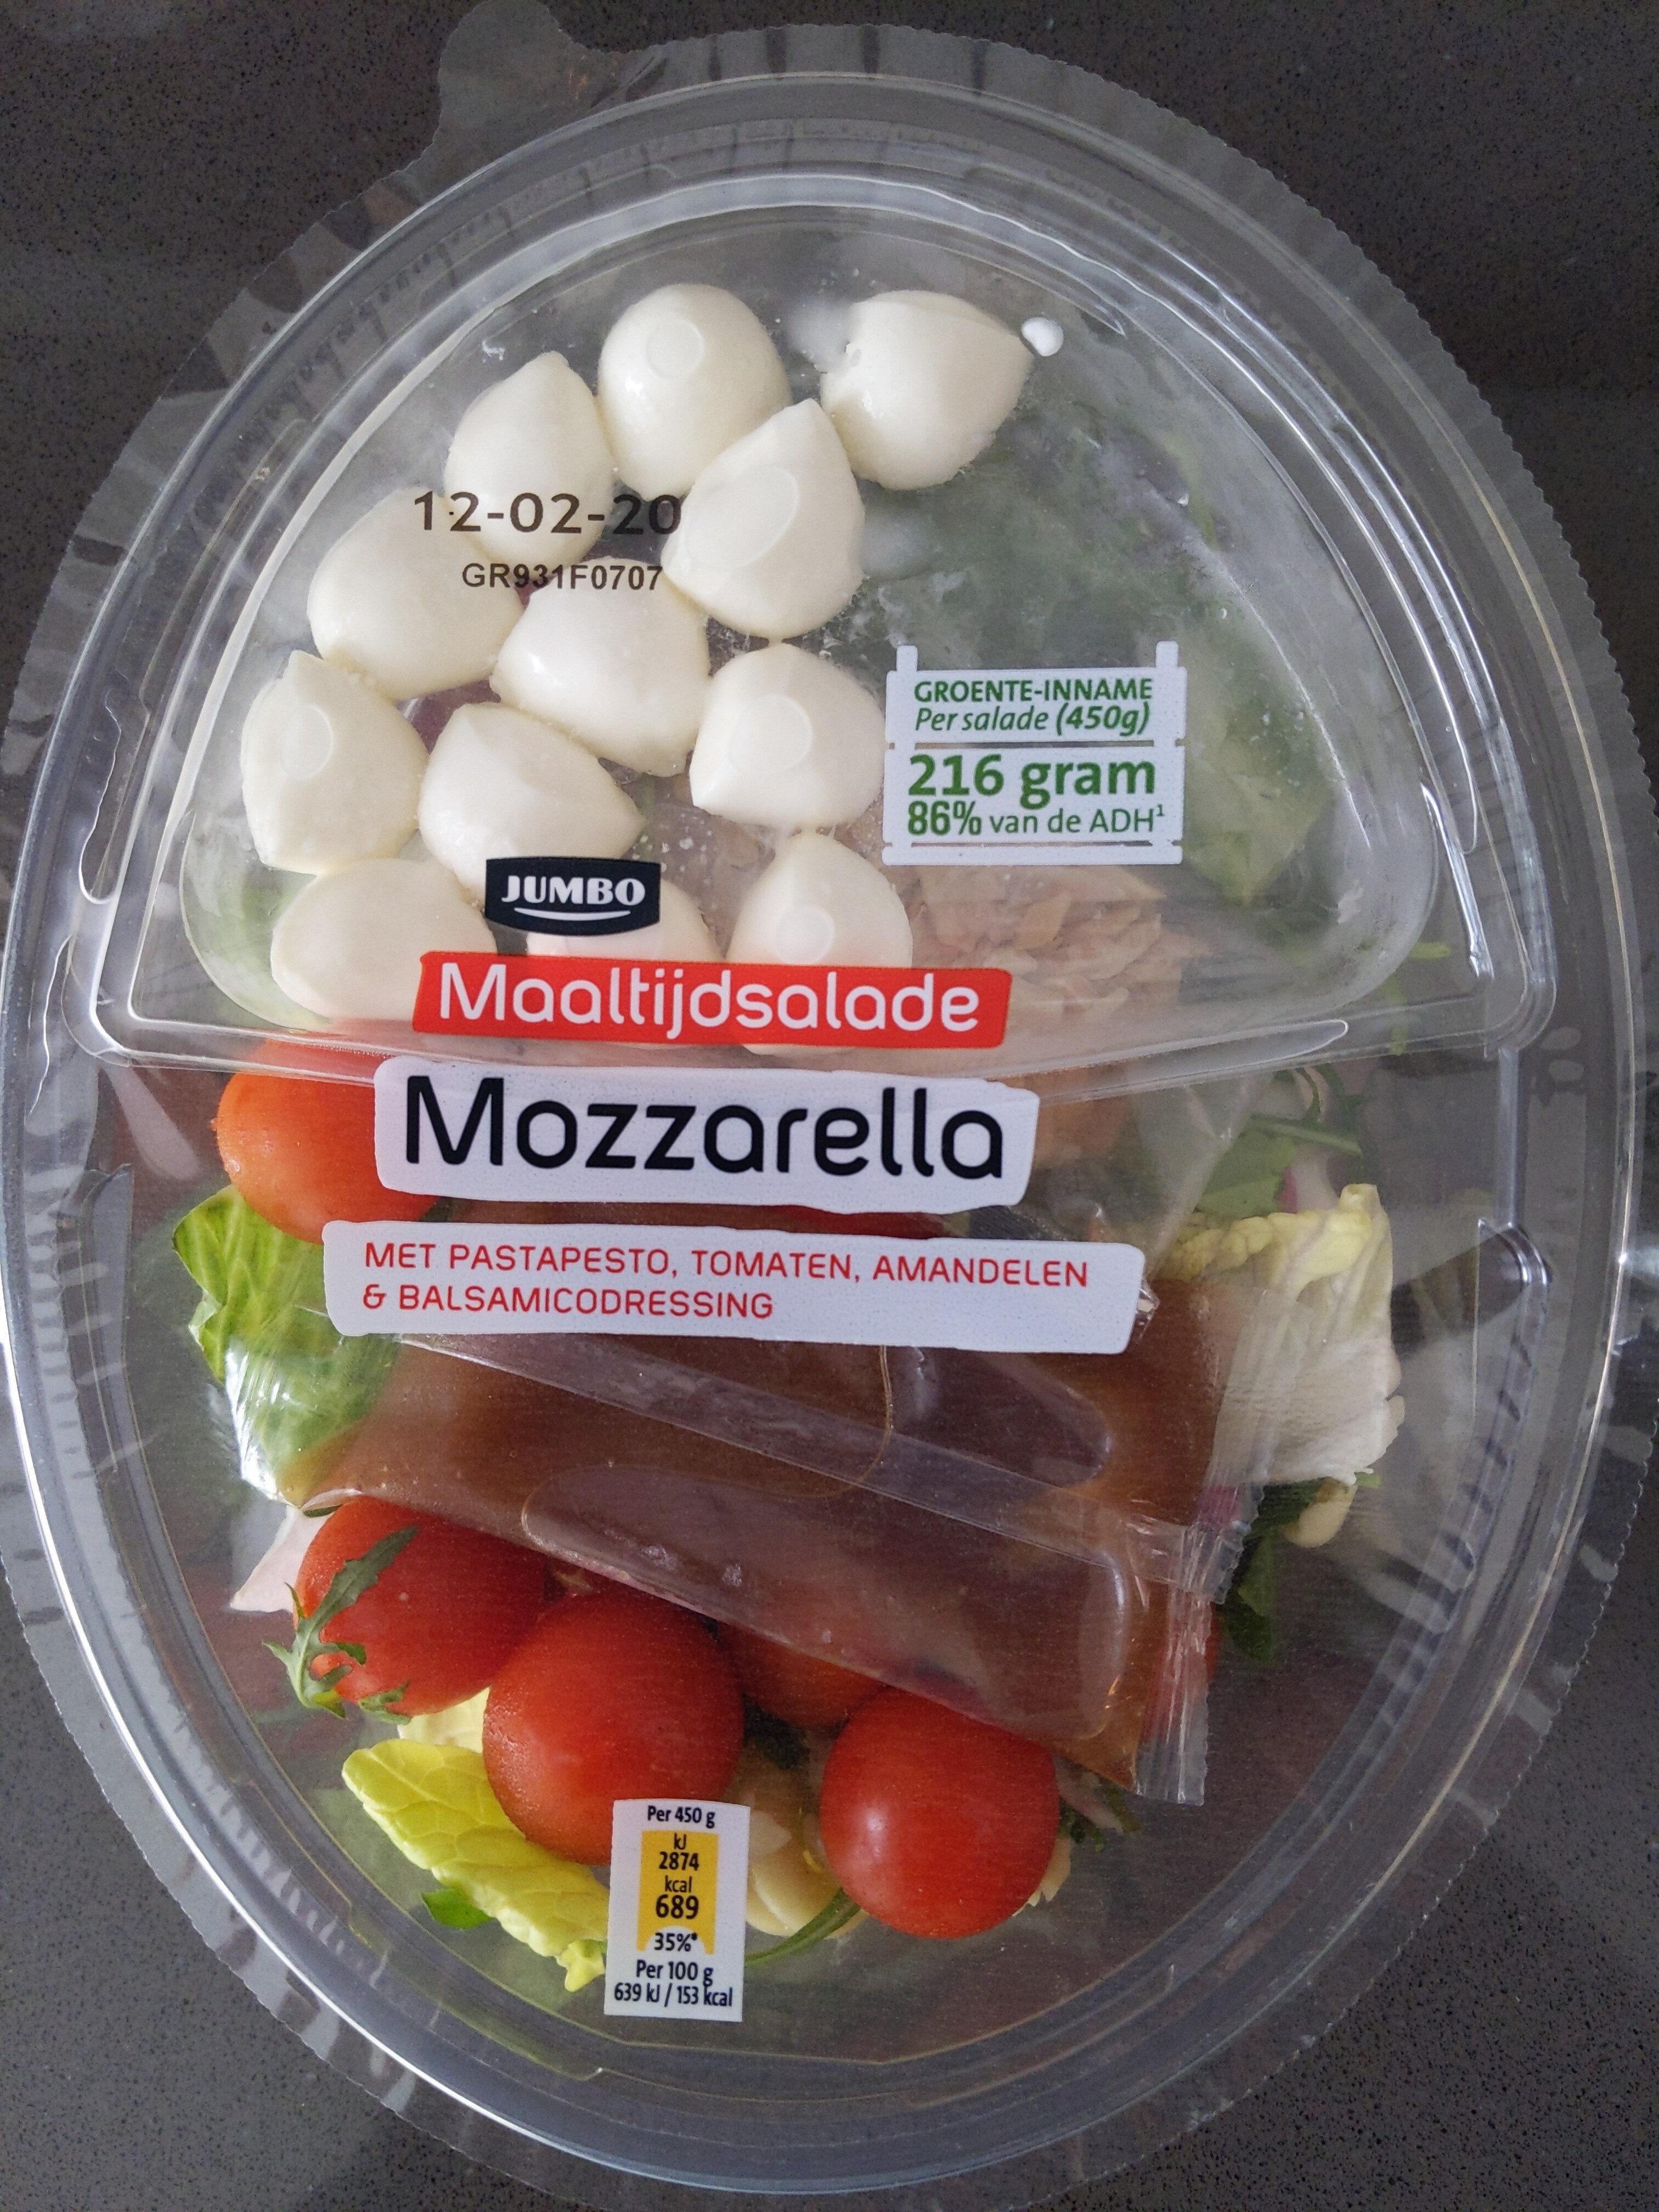 Maaltijdsalade Mozzarella - Product - nl